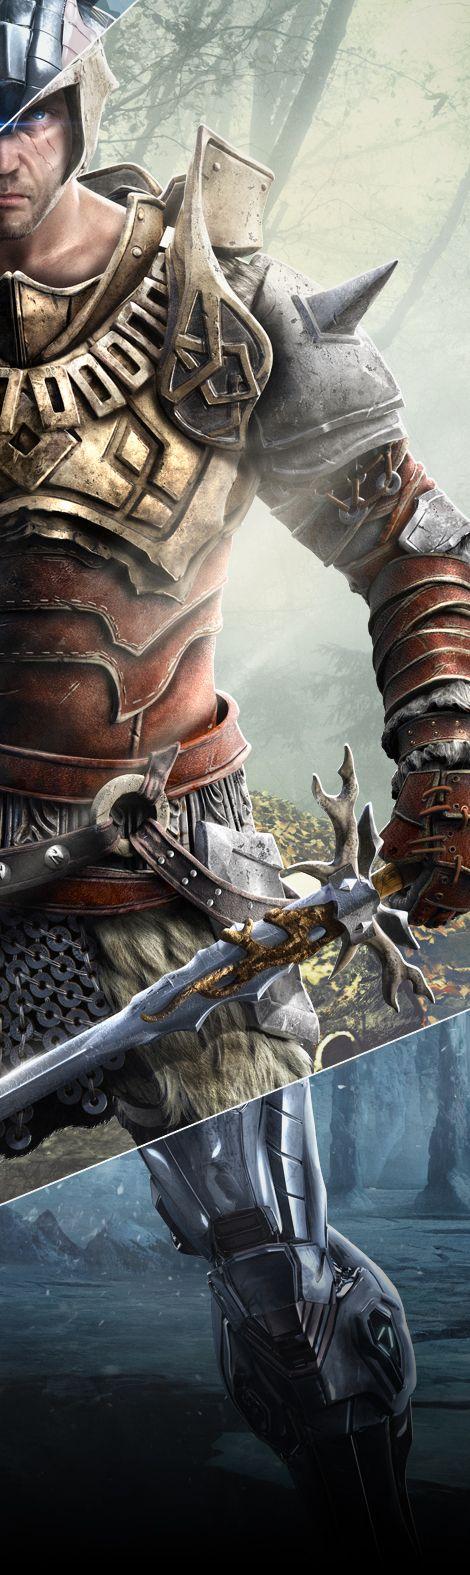 [GamersGate] TEKKEN 7 - Base Game ($31.49 / 37% off) Deluxe Edition ($52.49 / 30% off) Season Pass ($20.49 / 18% off)